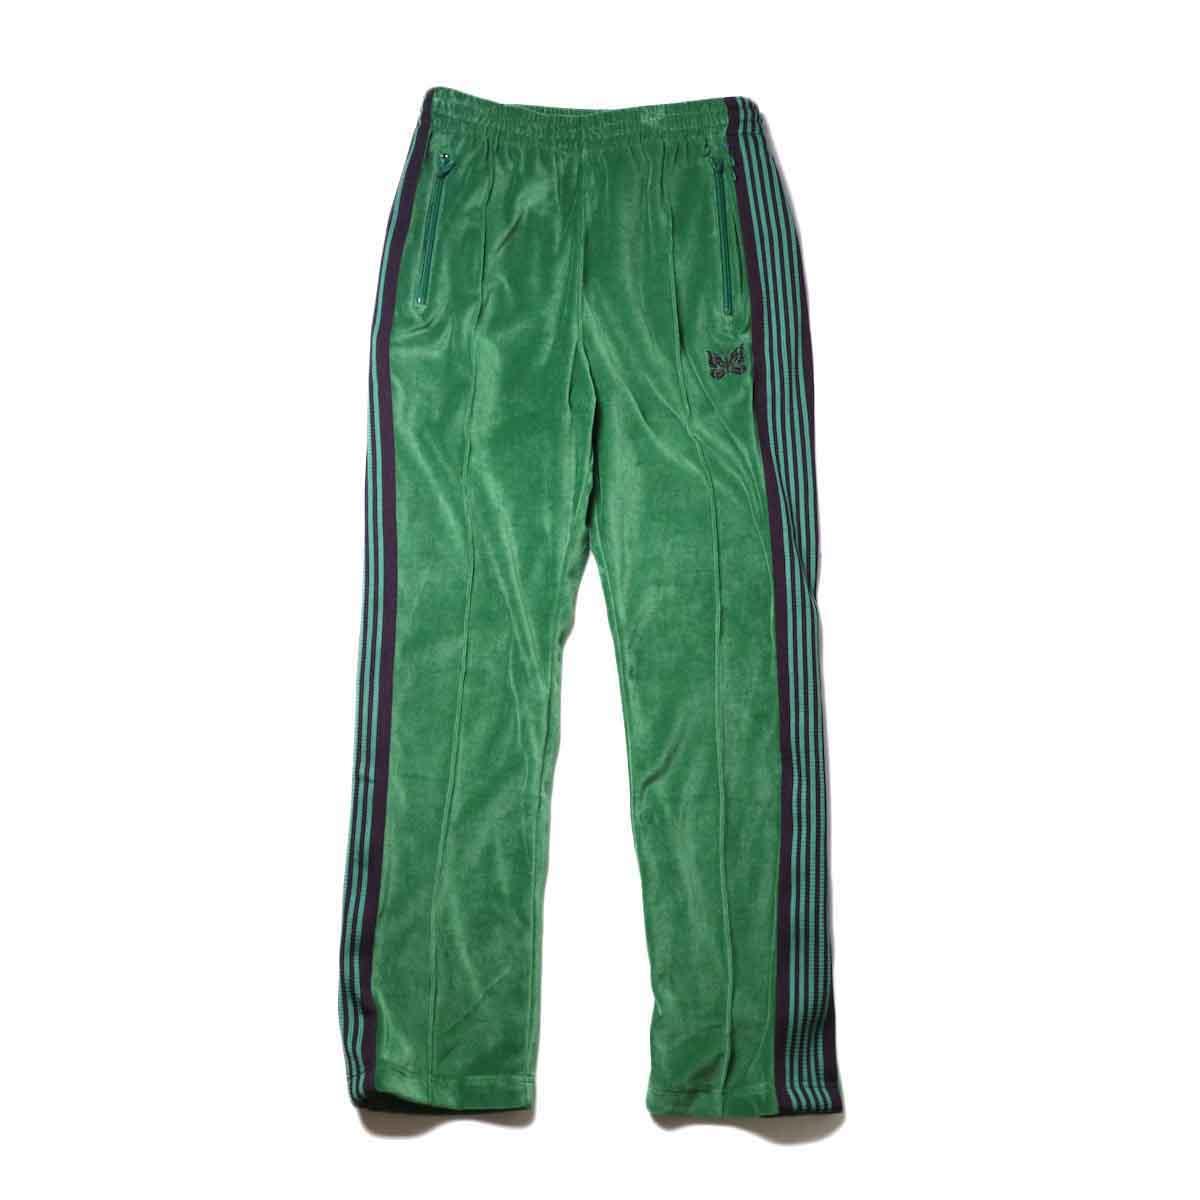 Needles / Narrow Track Pant -C/Pe Velour (Green)